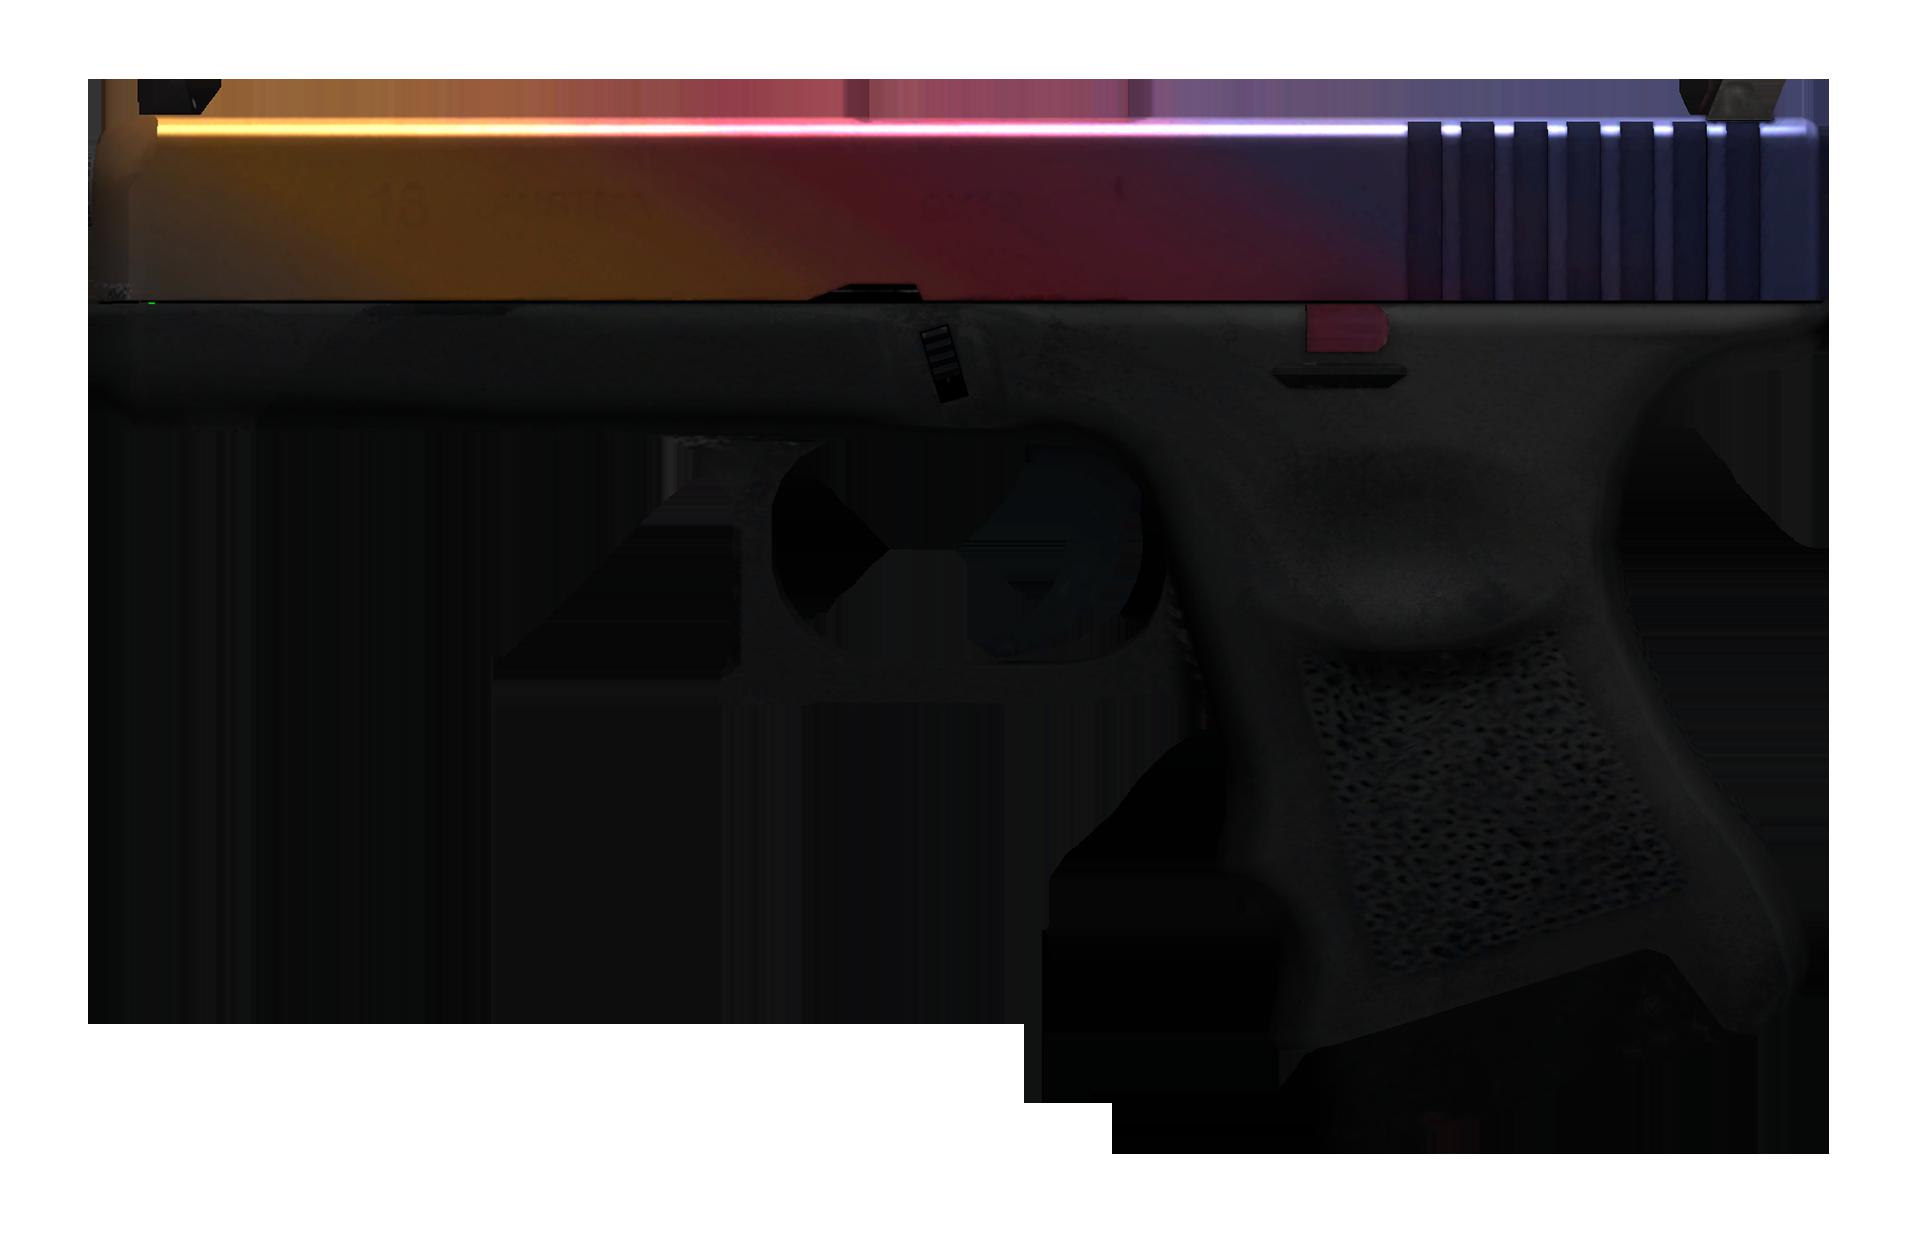 Glock-18 Fade Large Rendering